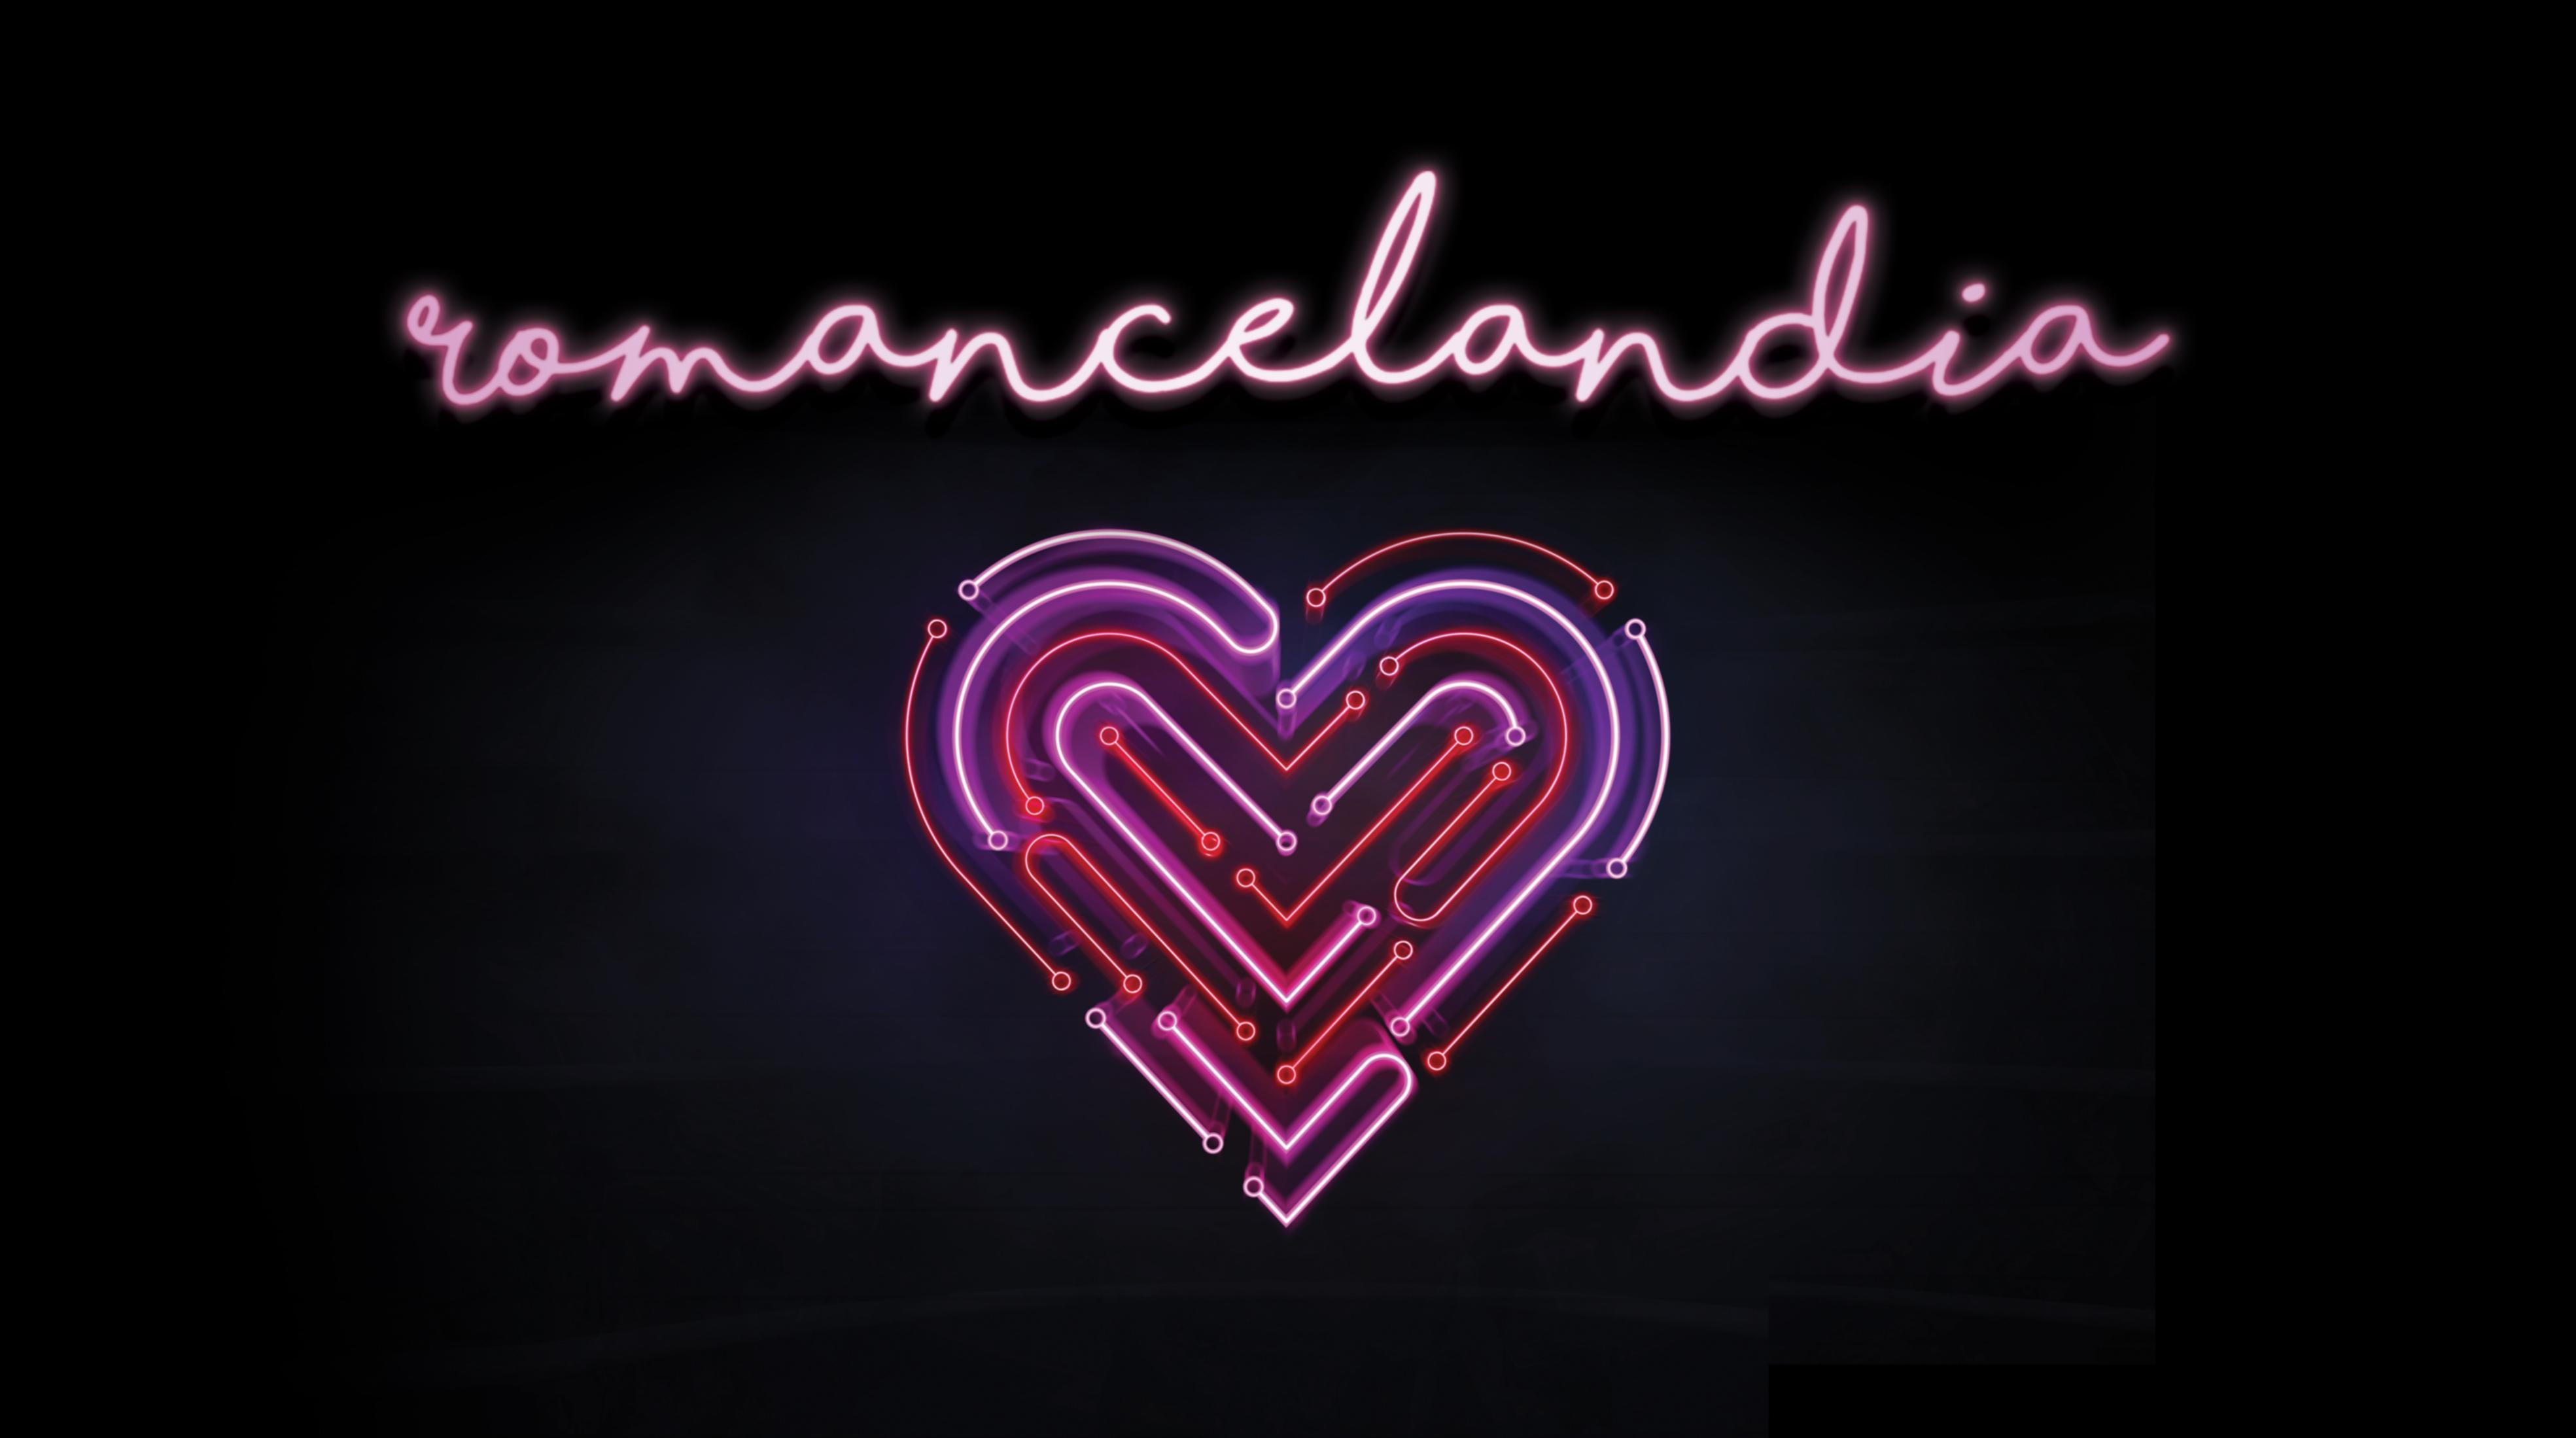 Romancelandia, a Short Story by Camilla Monk